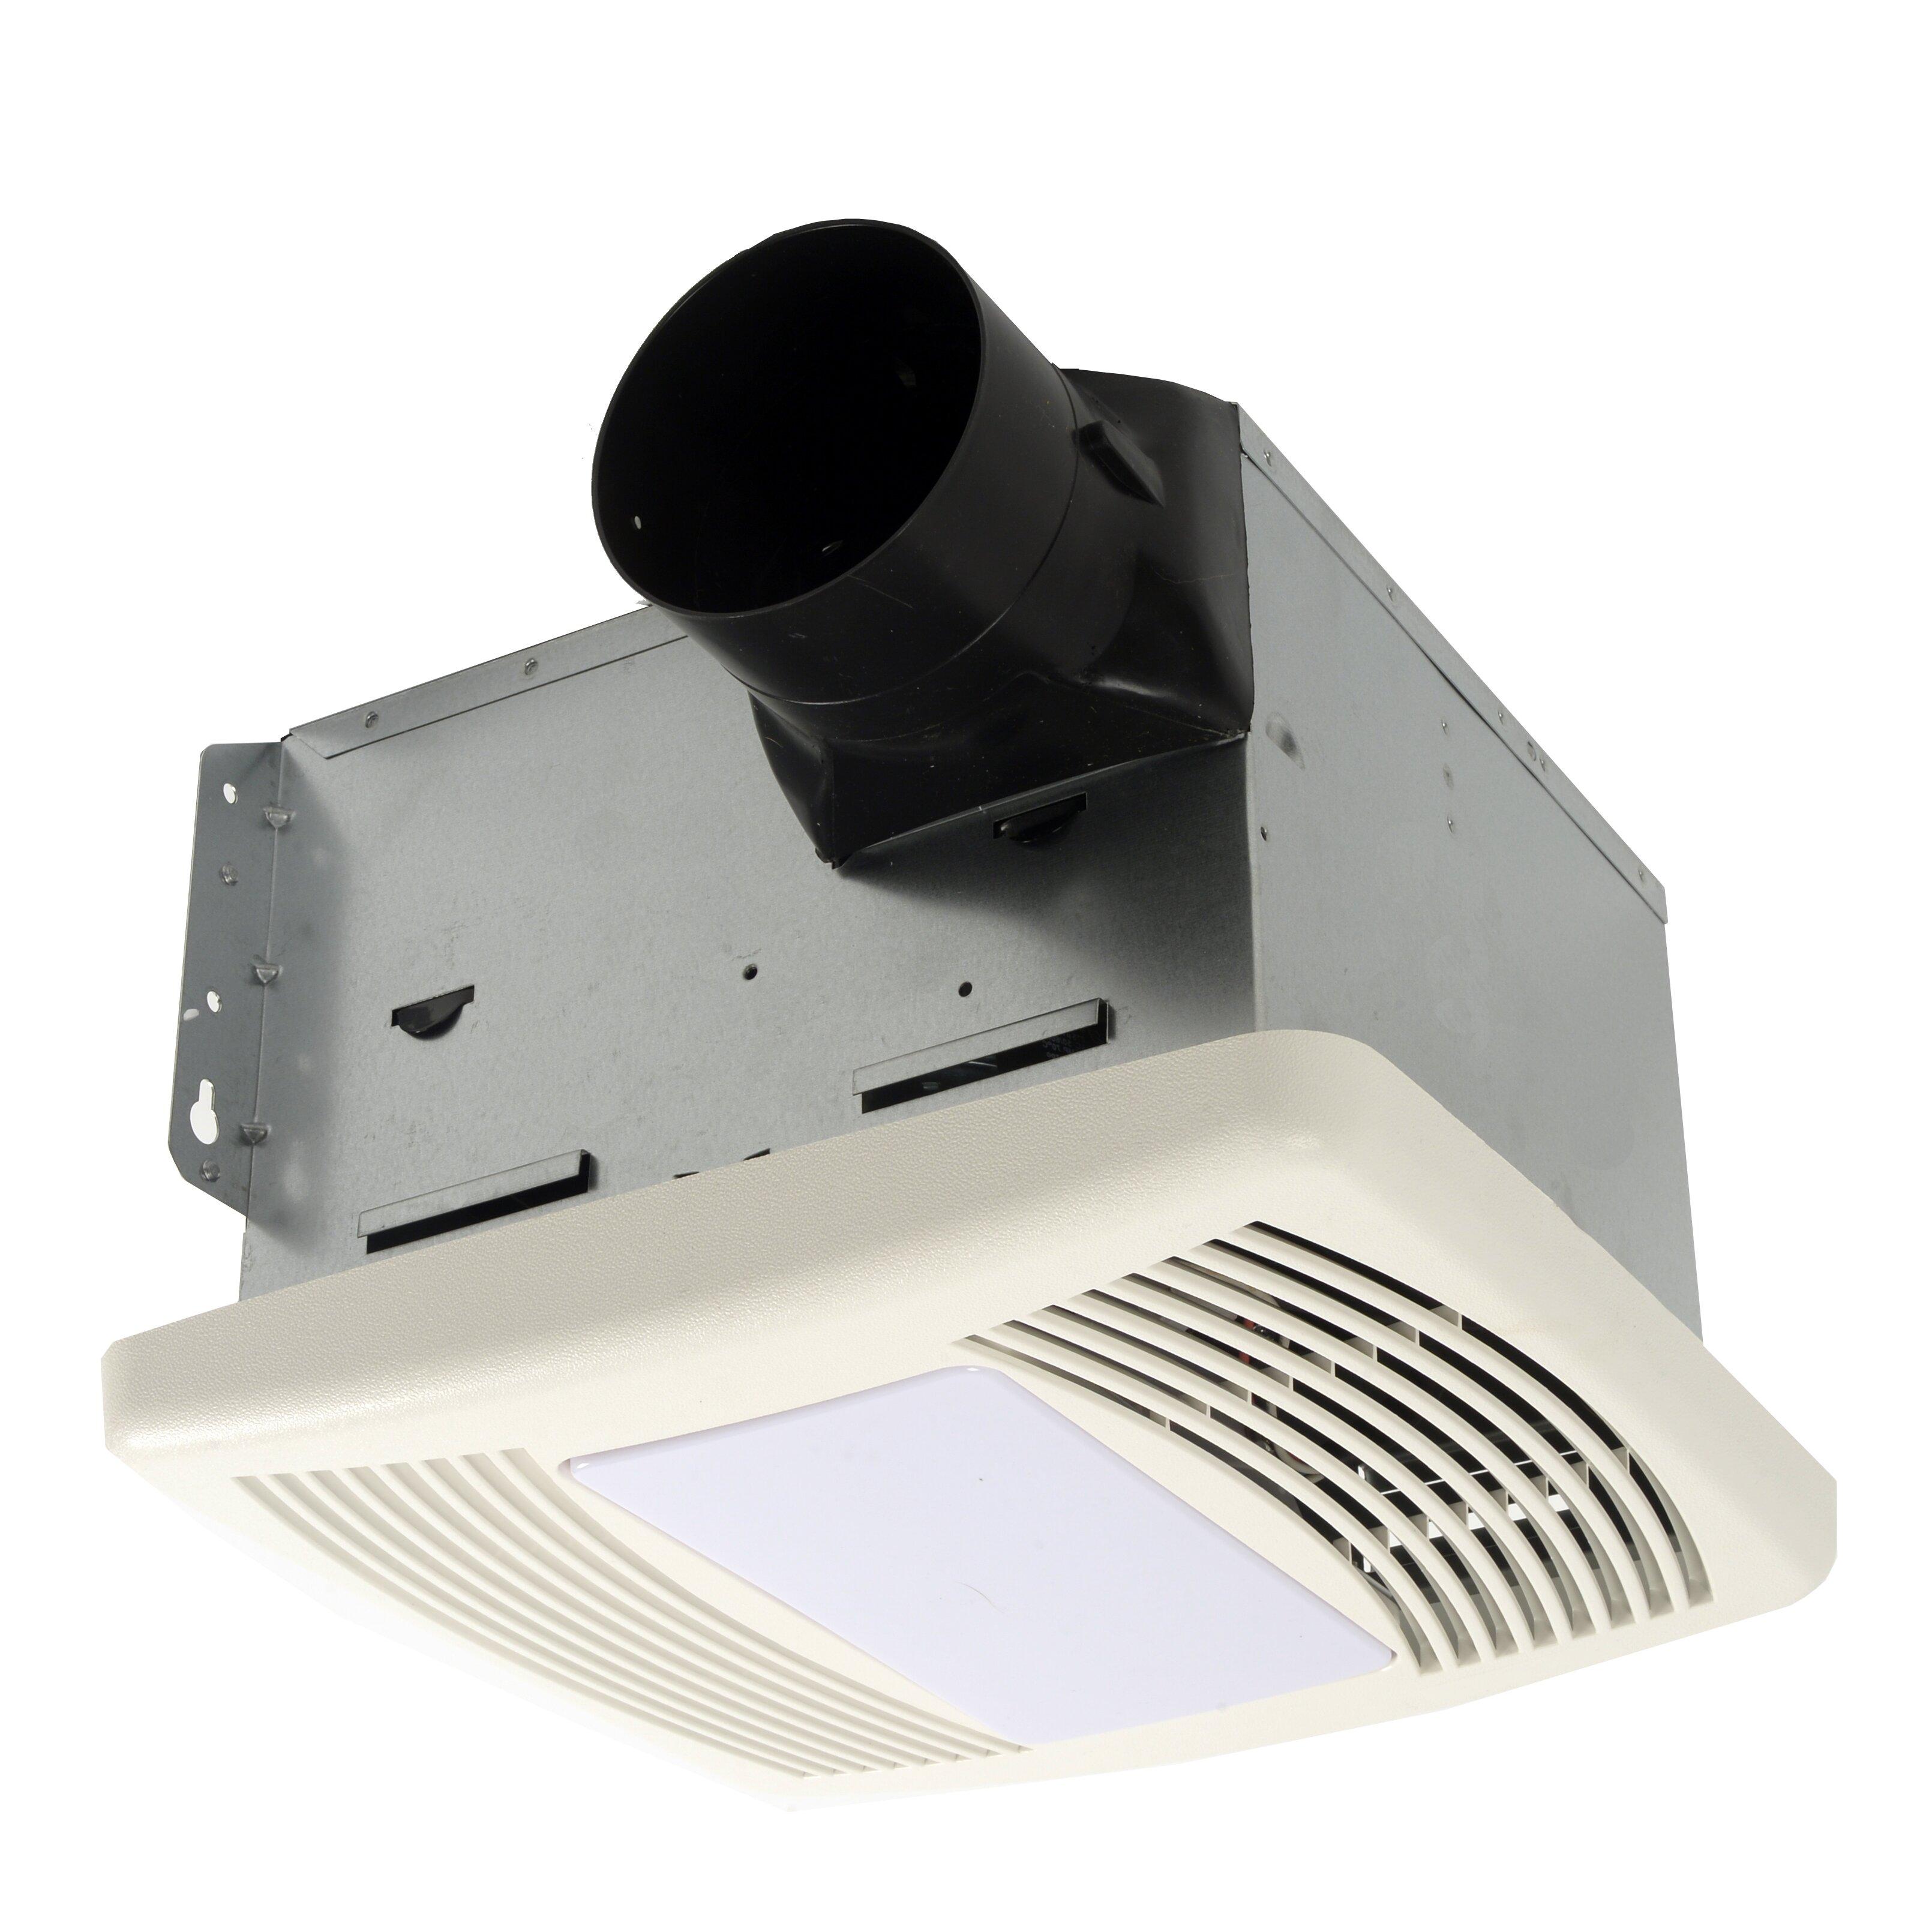 Cyclone Hushtone 150 Cfm Energy Star Bathroom Fan With Motion. Calculate Cfm For Bathroom Fan